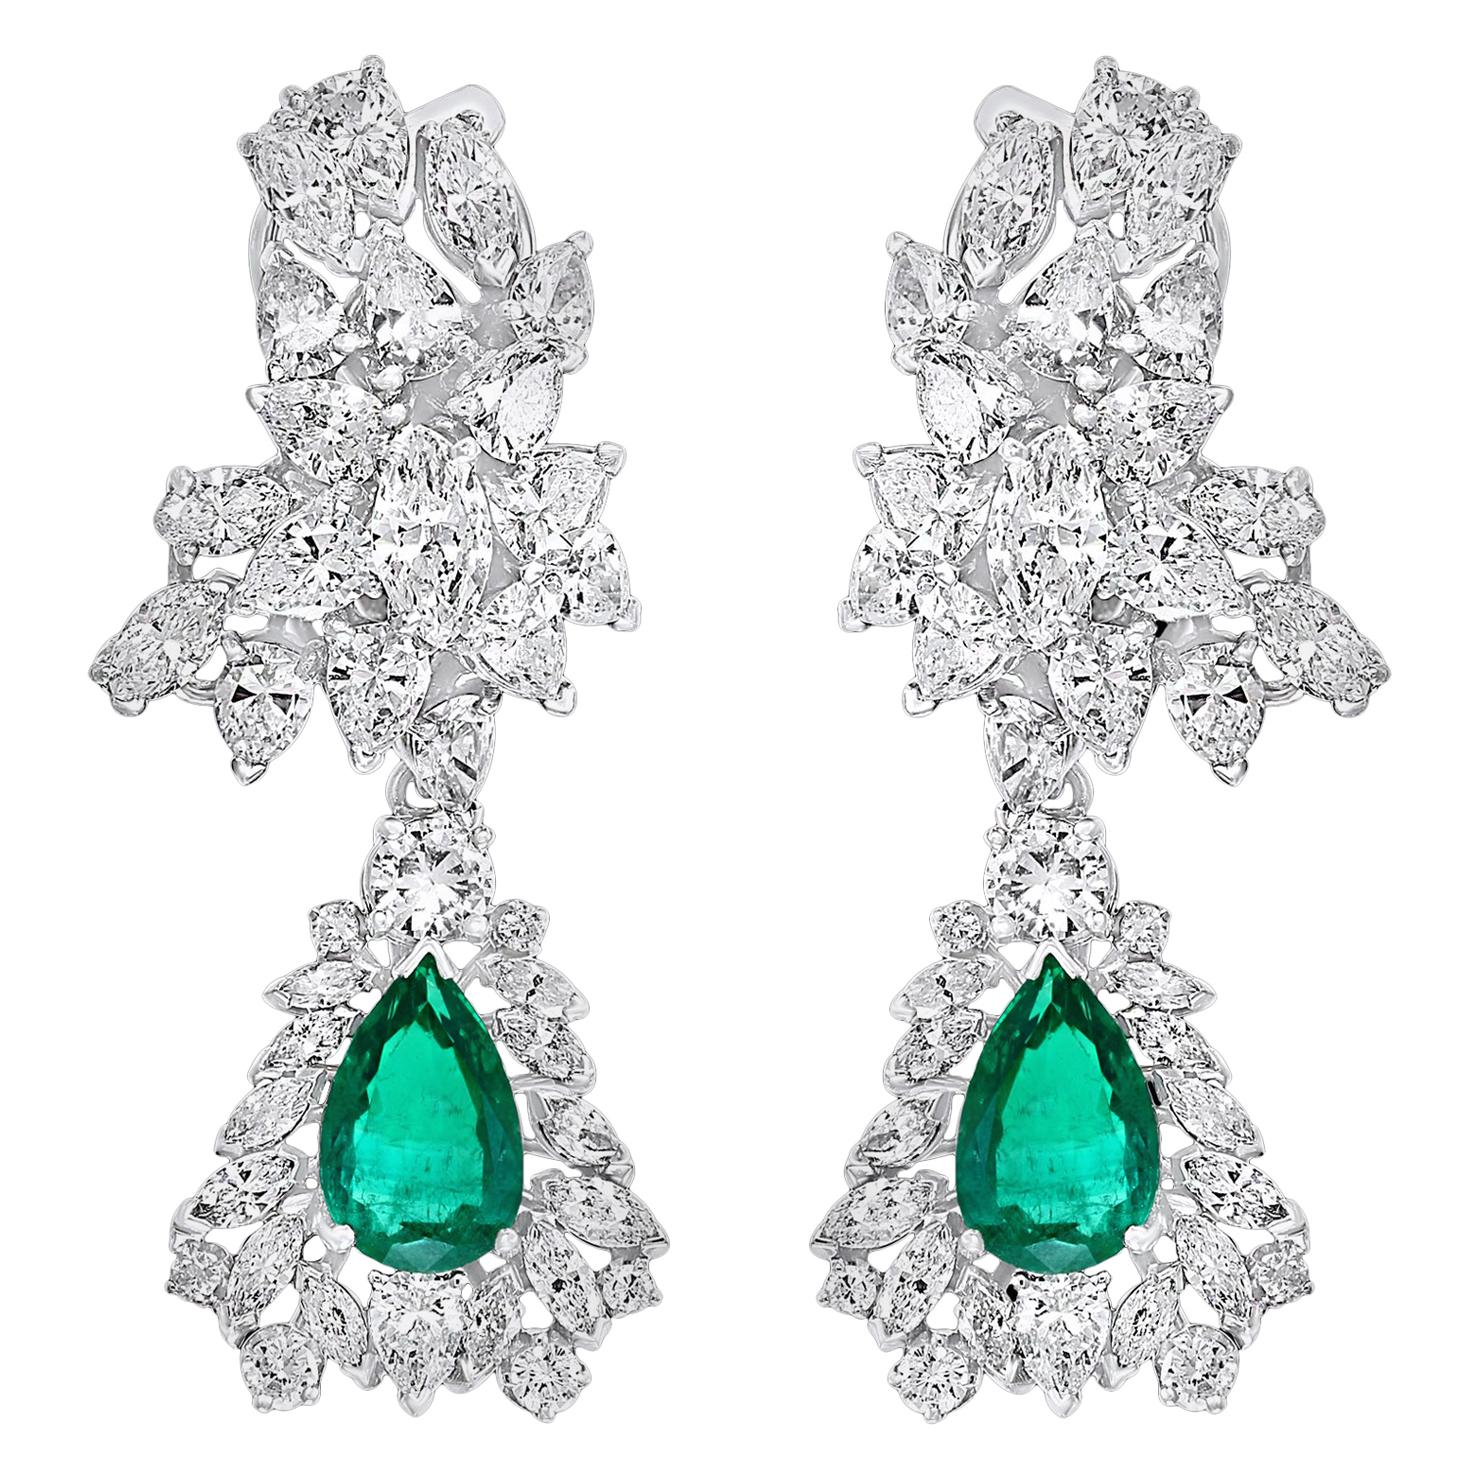 1960 AGL Certified Colombian Minor Traditional Emerald Diamond Drop Earrings PT